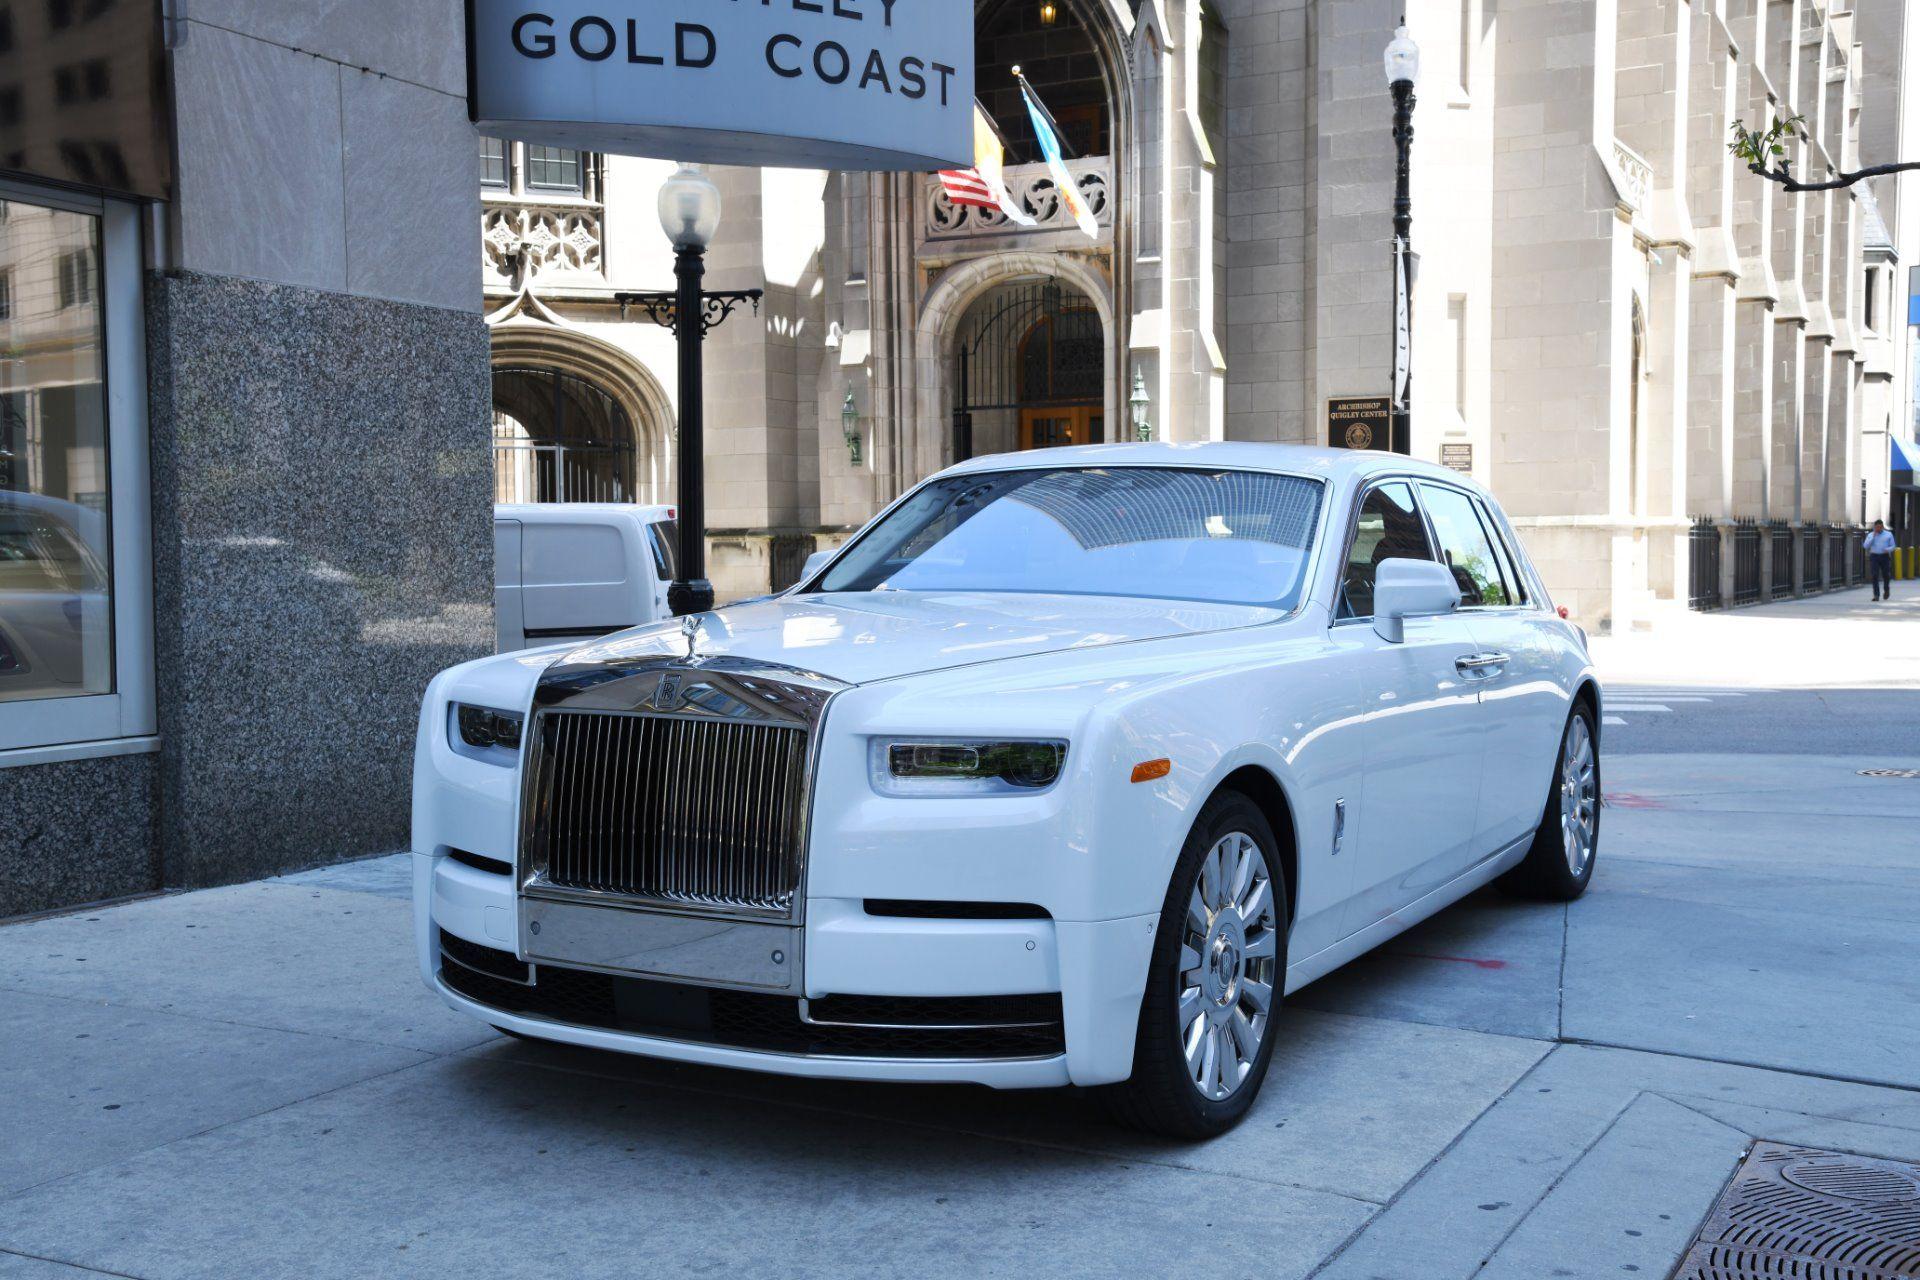 2018 Rolls Royce Phantom Taking Orders Now Stock R514 For Sale Near Chicago Il Il Rolls Royce Rolls Royce Phantom Rolls Royce Luxury Car Dealership